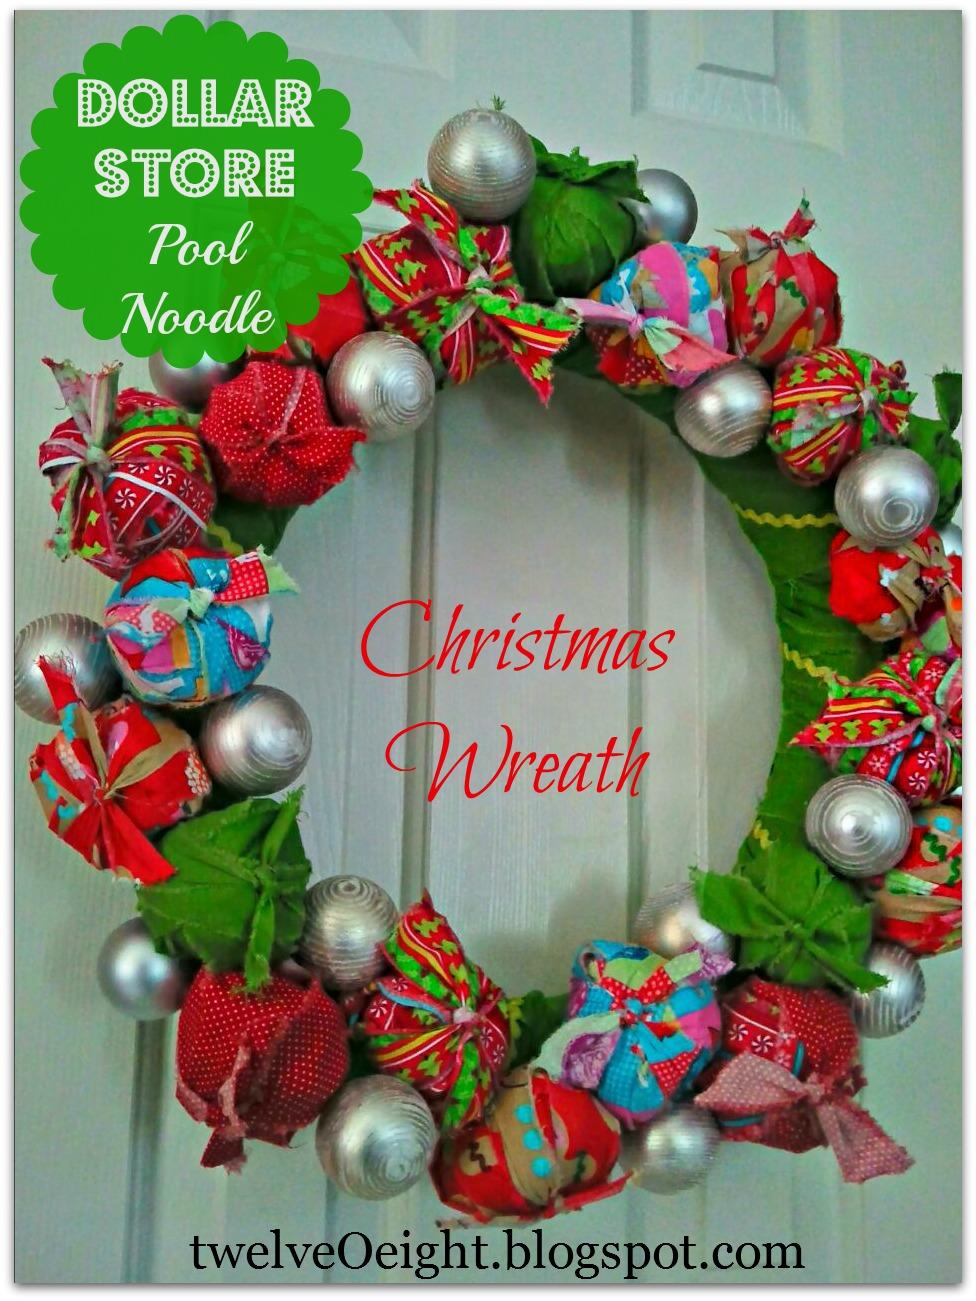 Dollar Tree Christmas Crafts.Dollar Store Christmas Crafts Pool Noodle Christmas Wreath